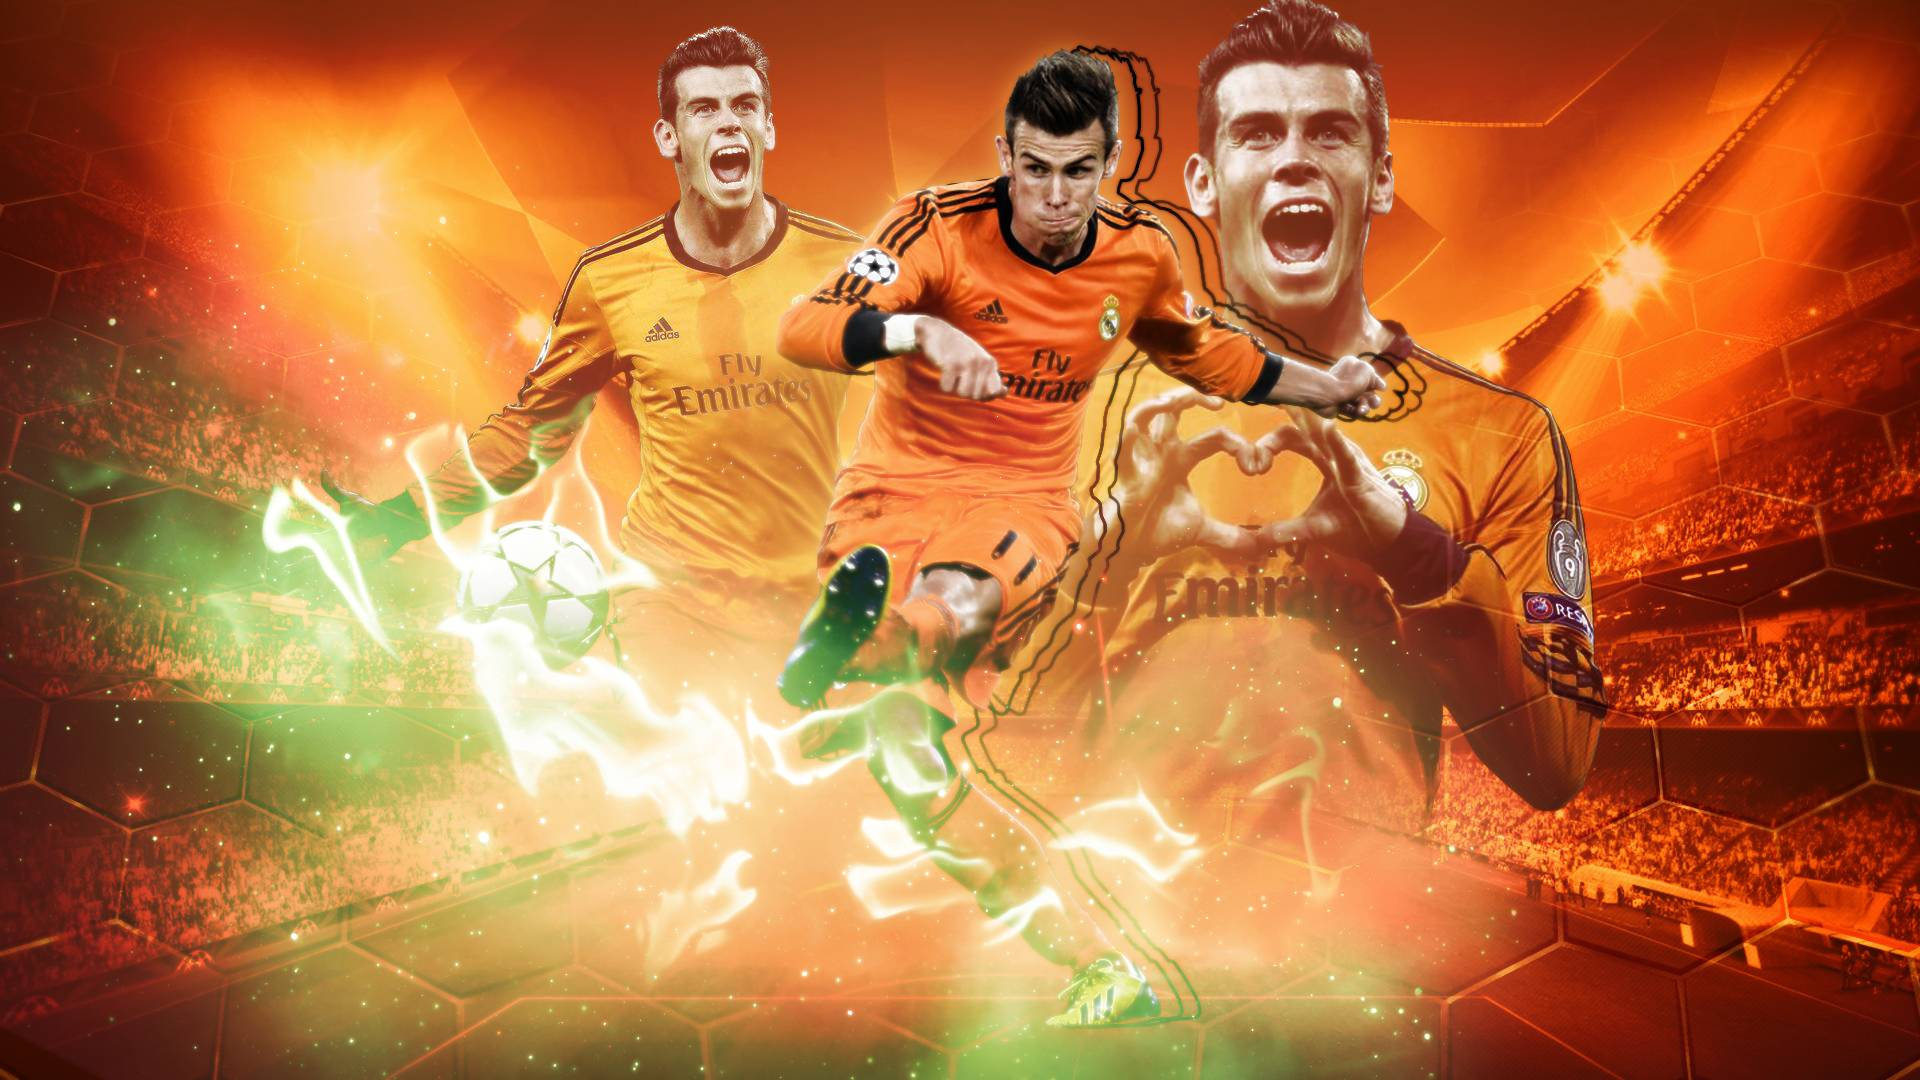 Gareth Bale wallpaper by BardockSonic on DeviantArt